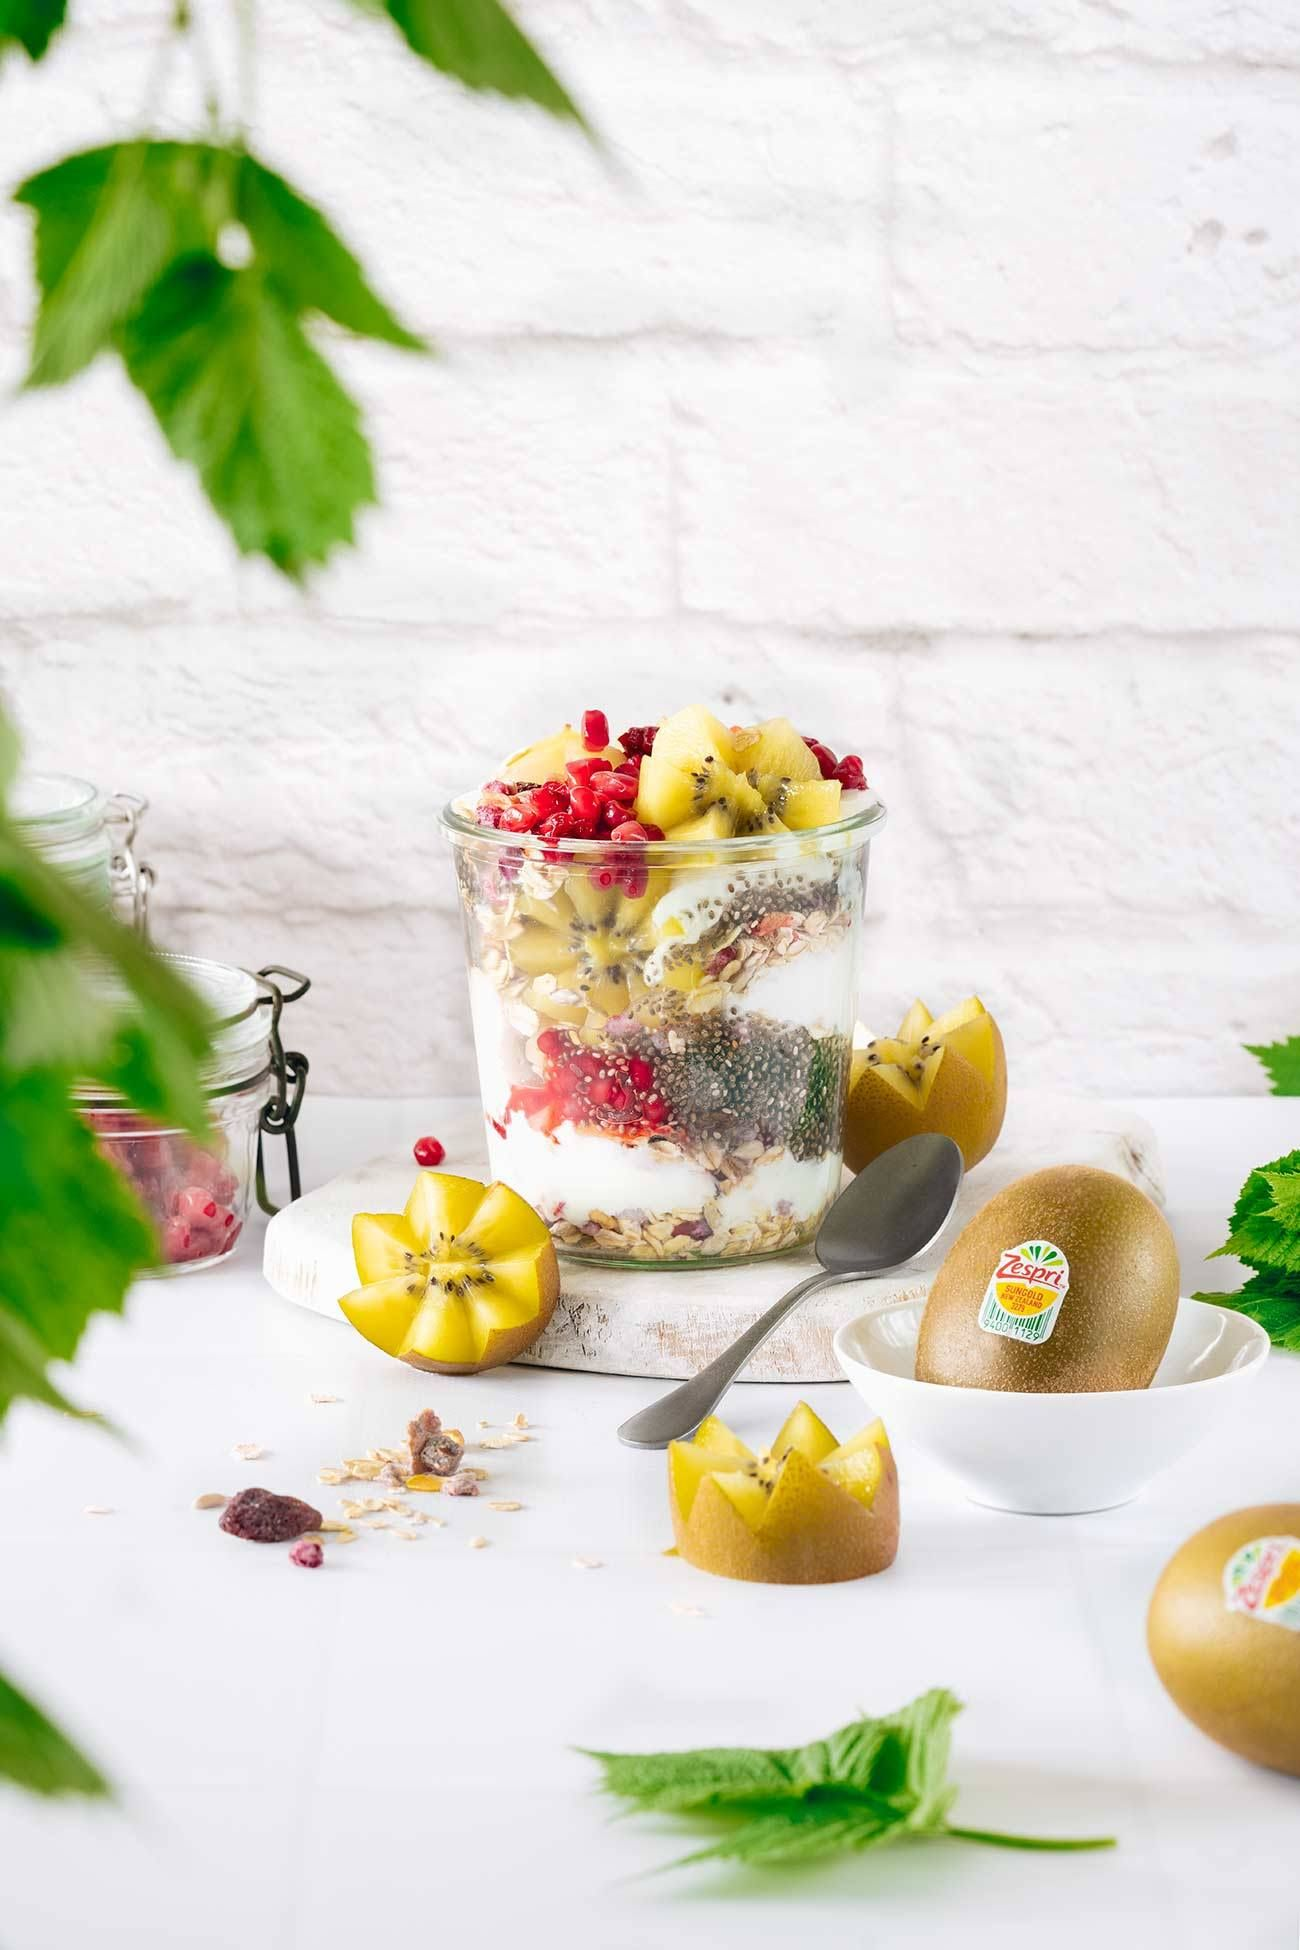 Mein Kiwi Frühstück  – Fruits // Obst